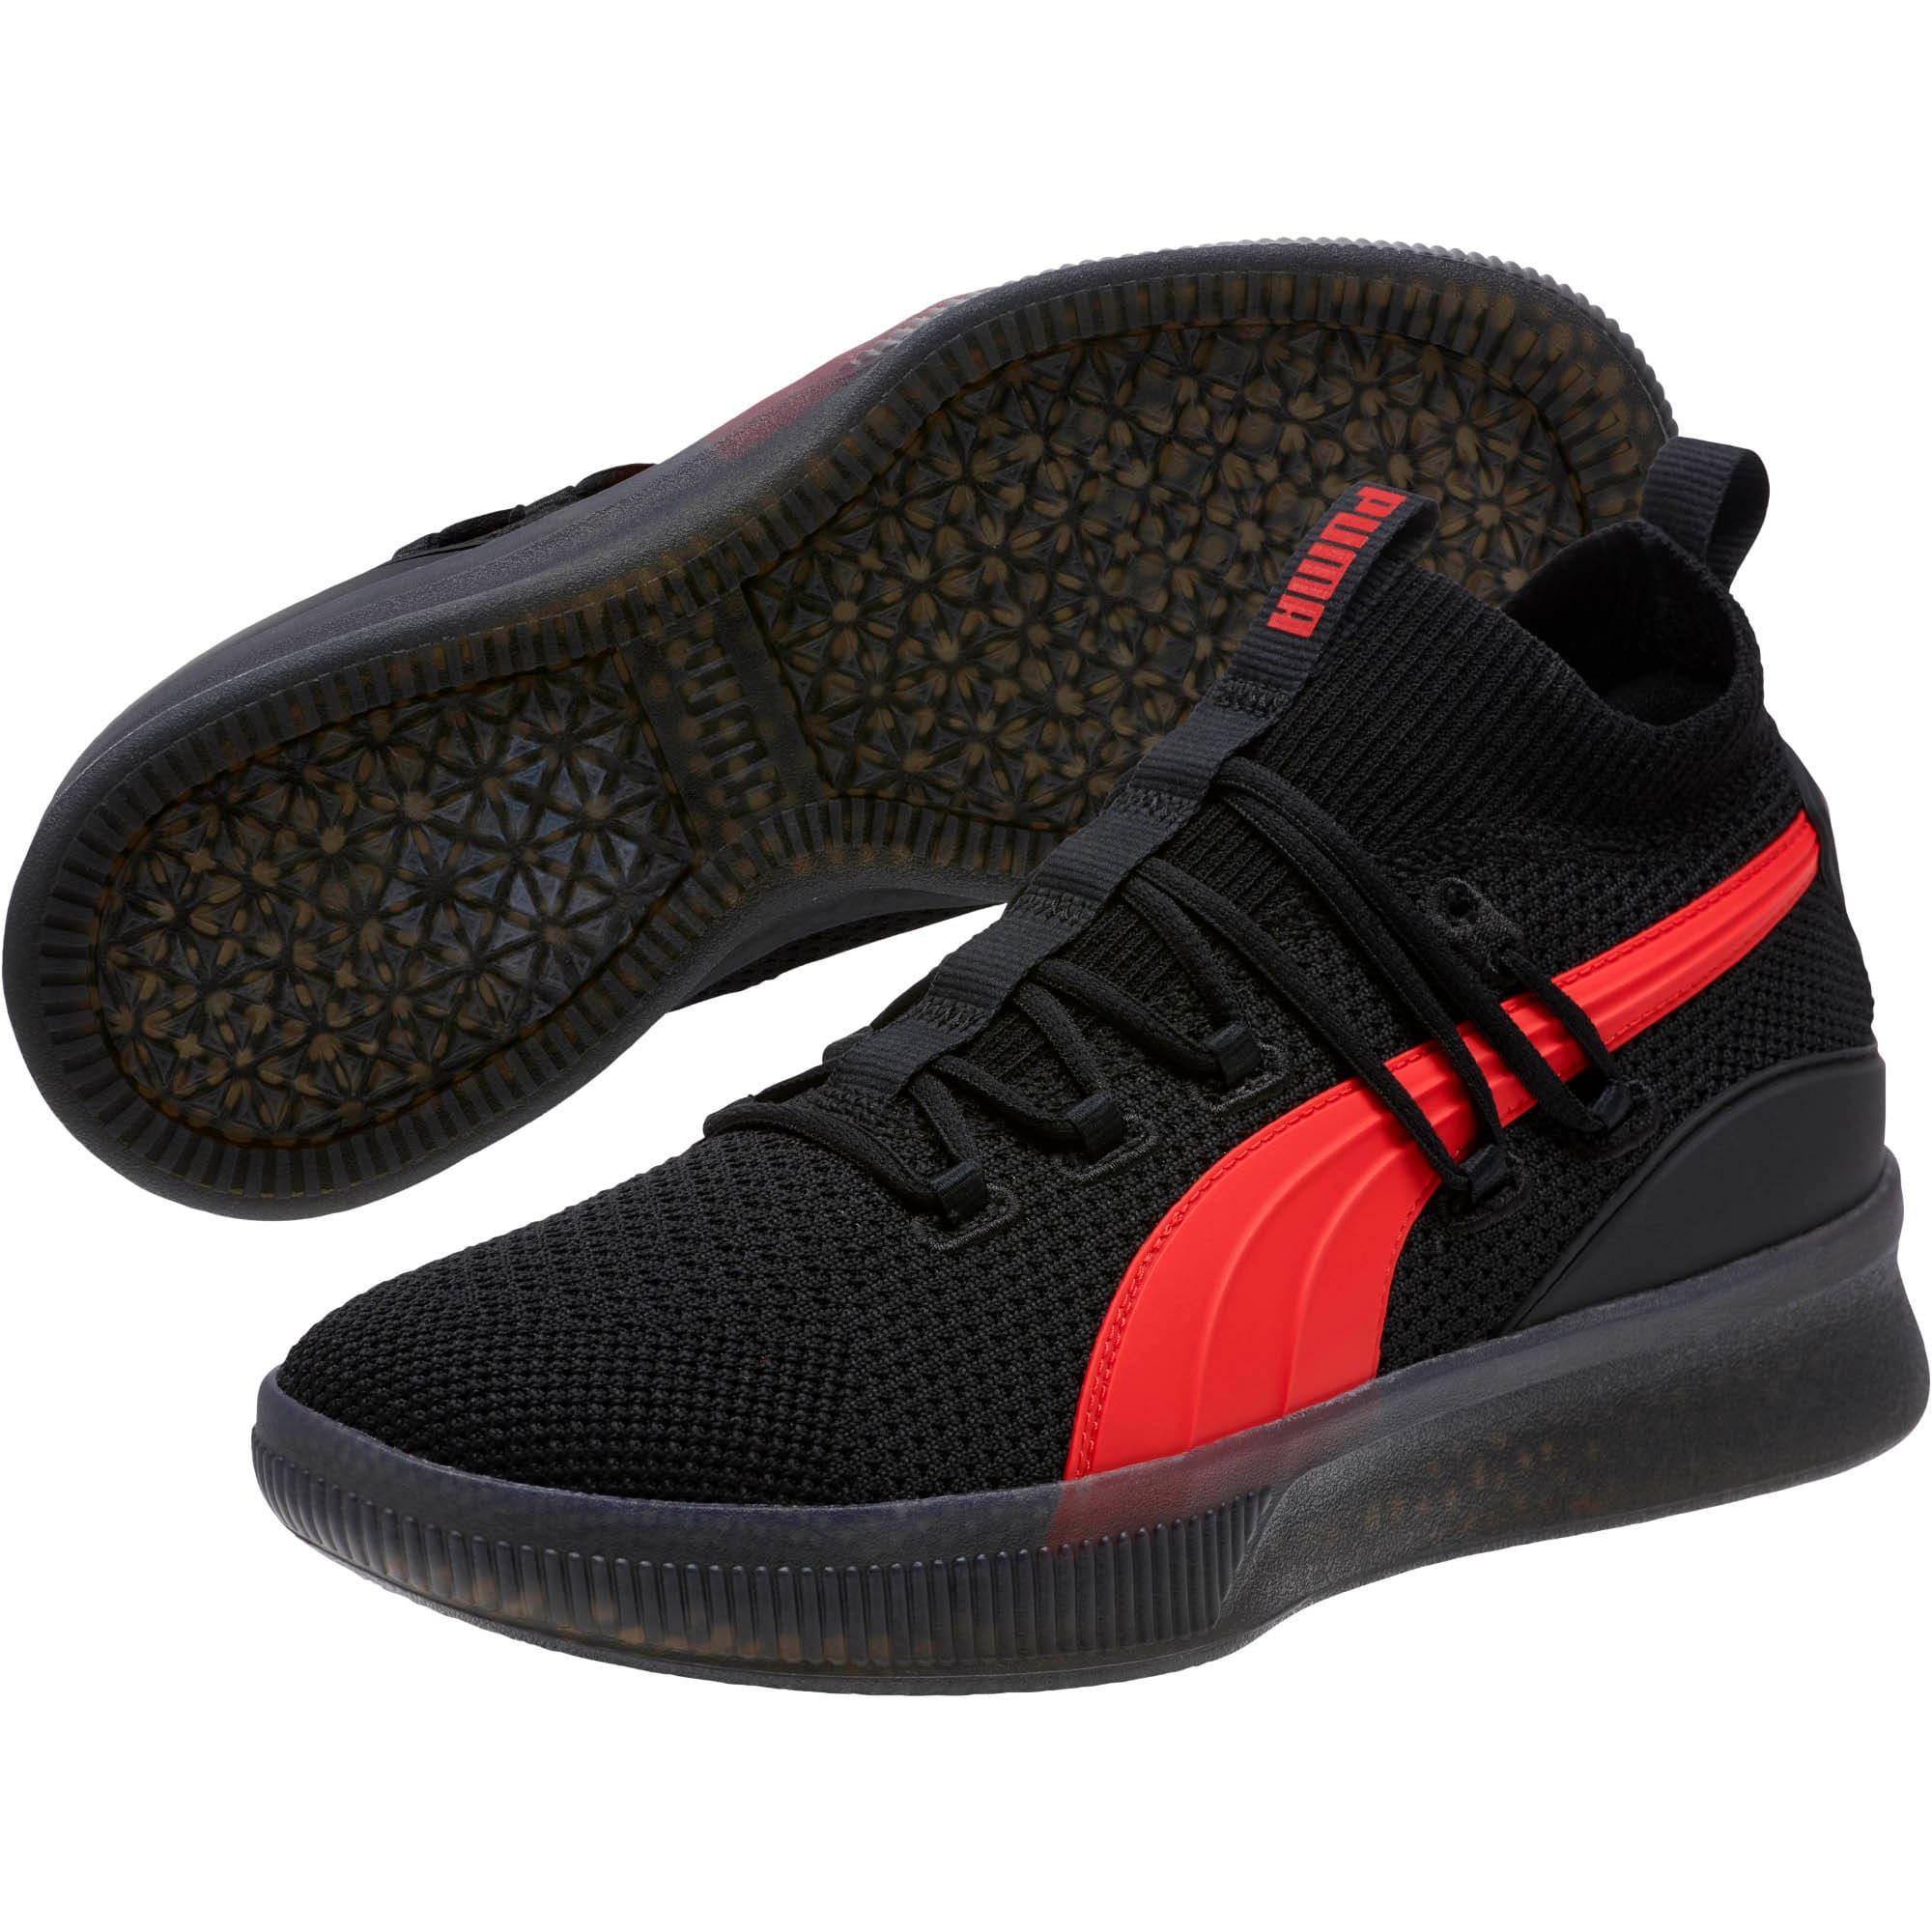 various colors cbc9b 203b8 Clyde Court Core Basketball Shoes